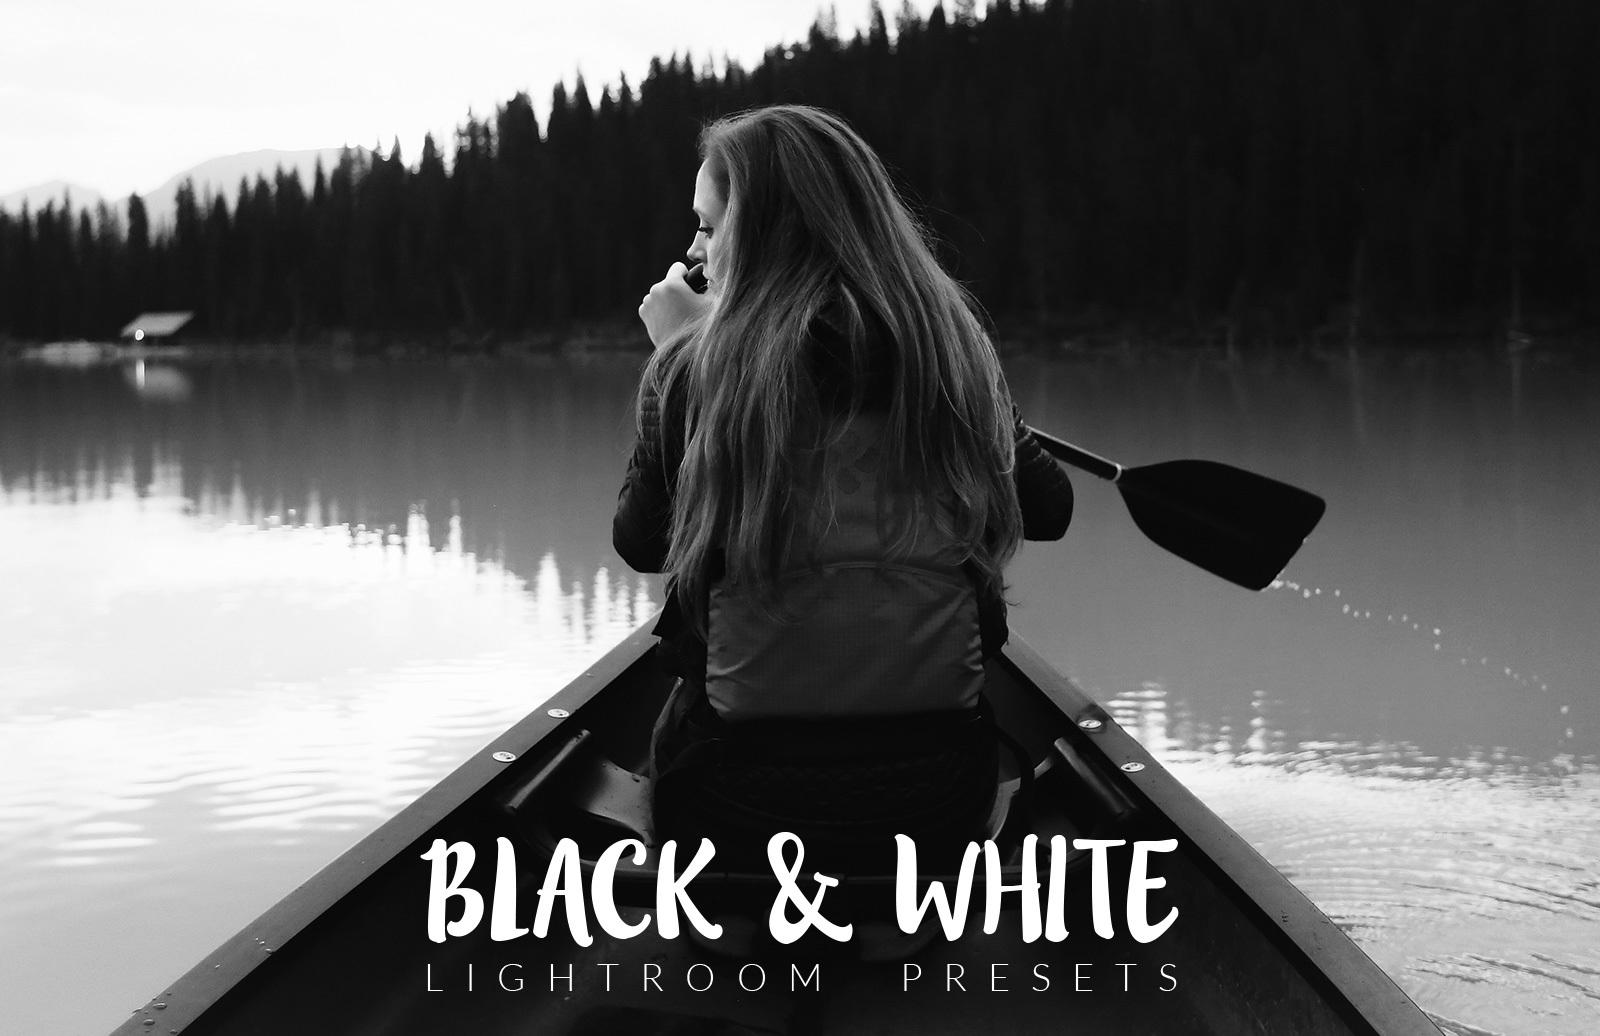 Black and White Lightroom Presets 2